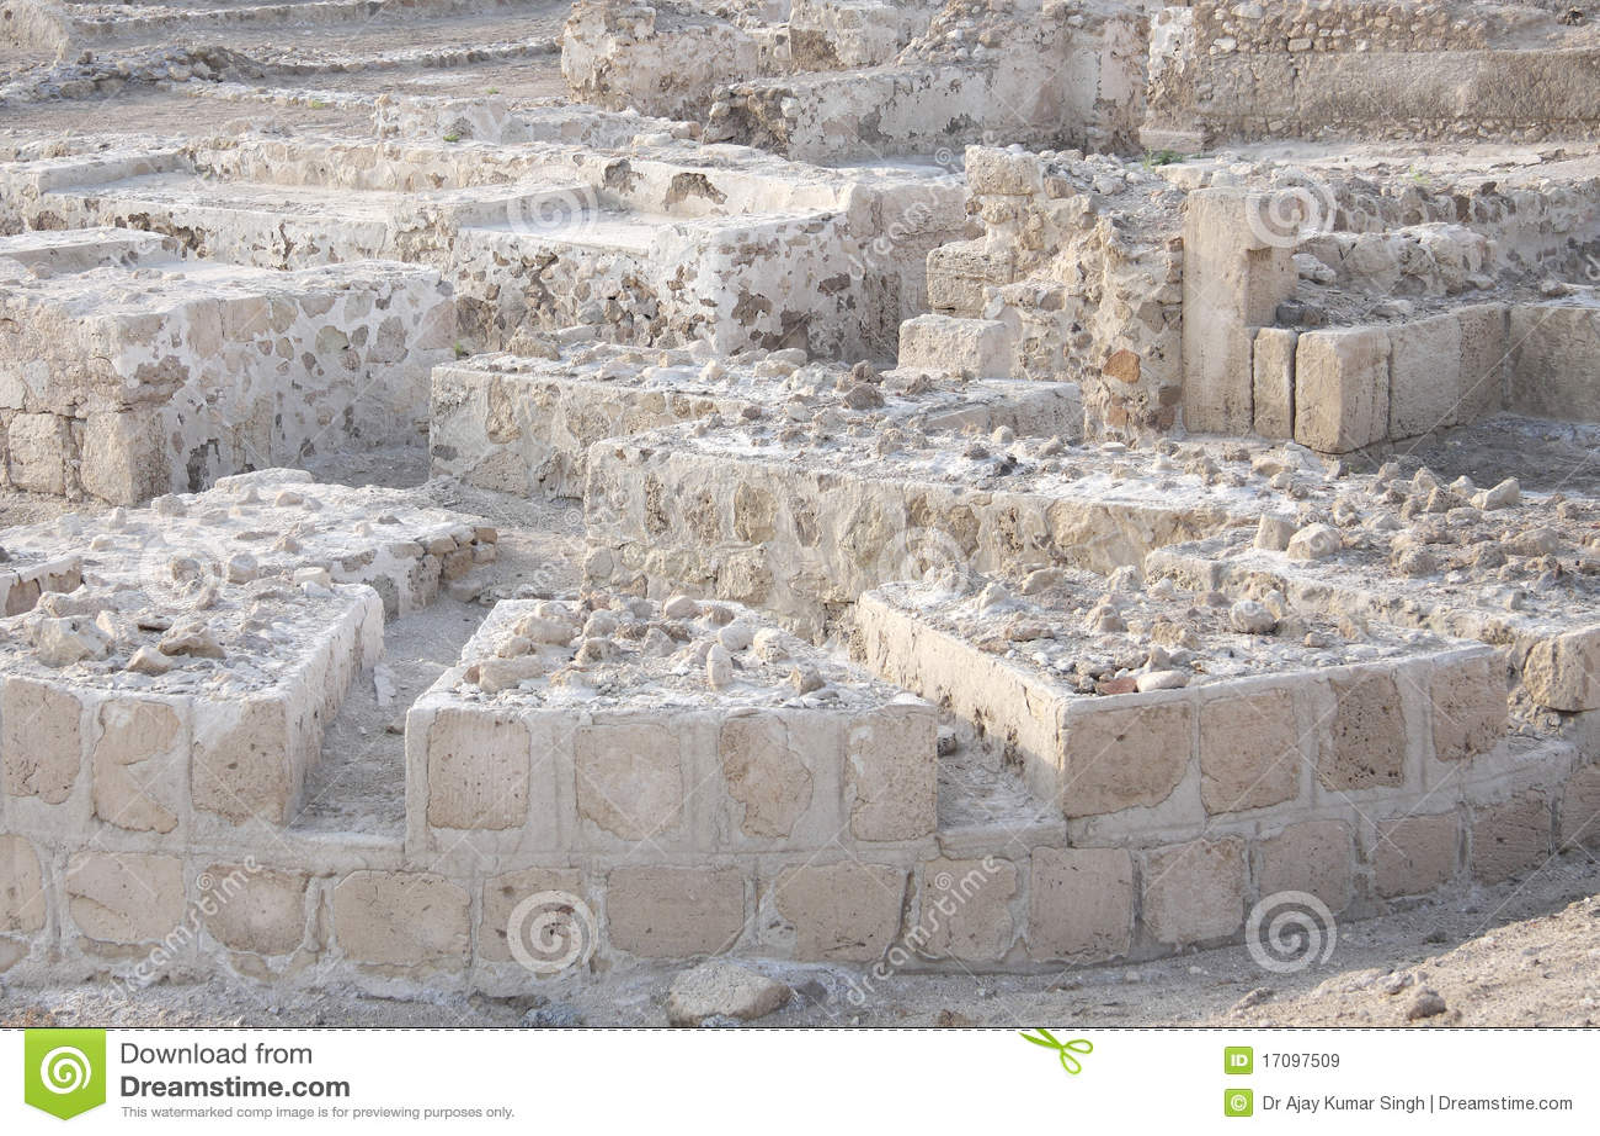 Ruins of Bahrain fort